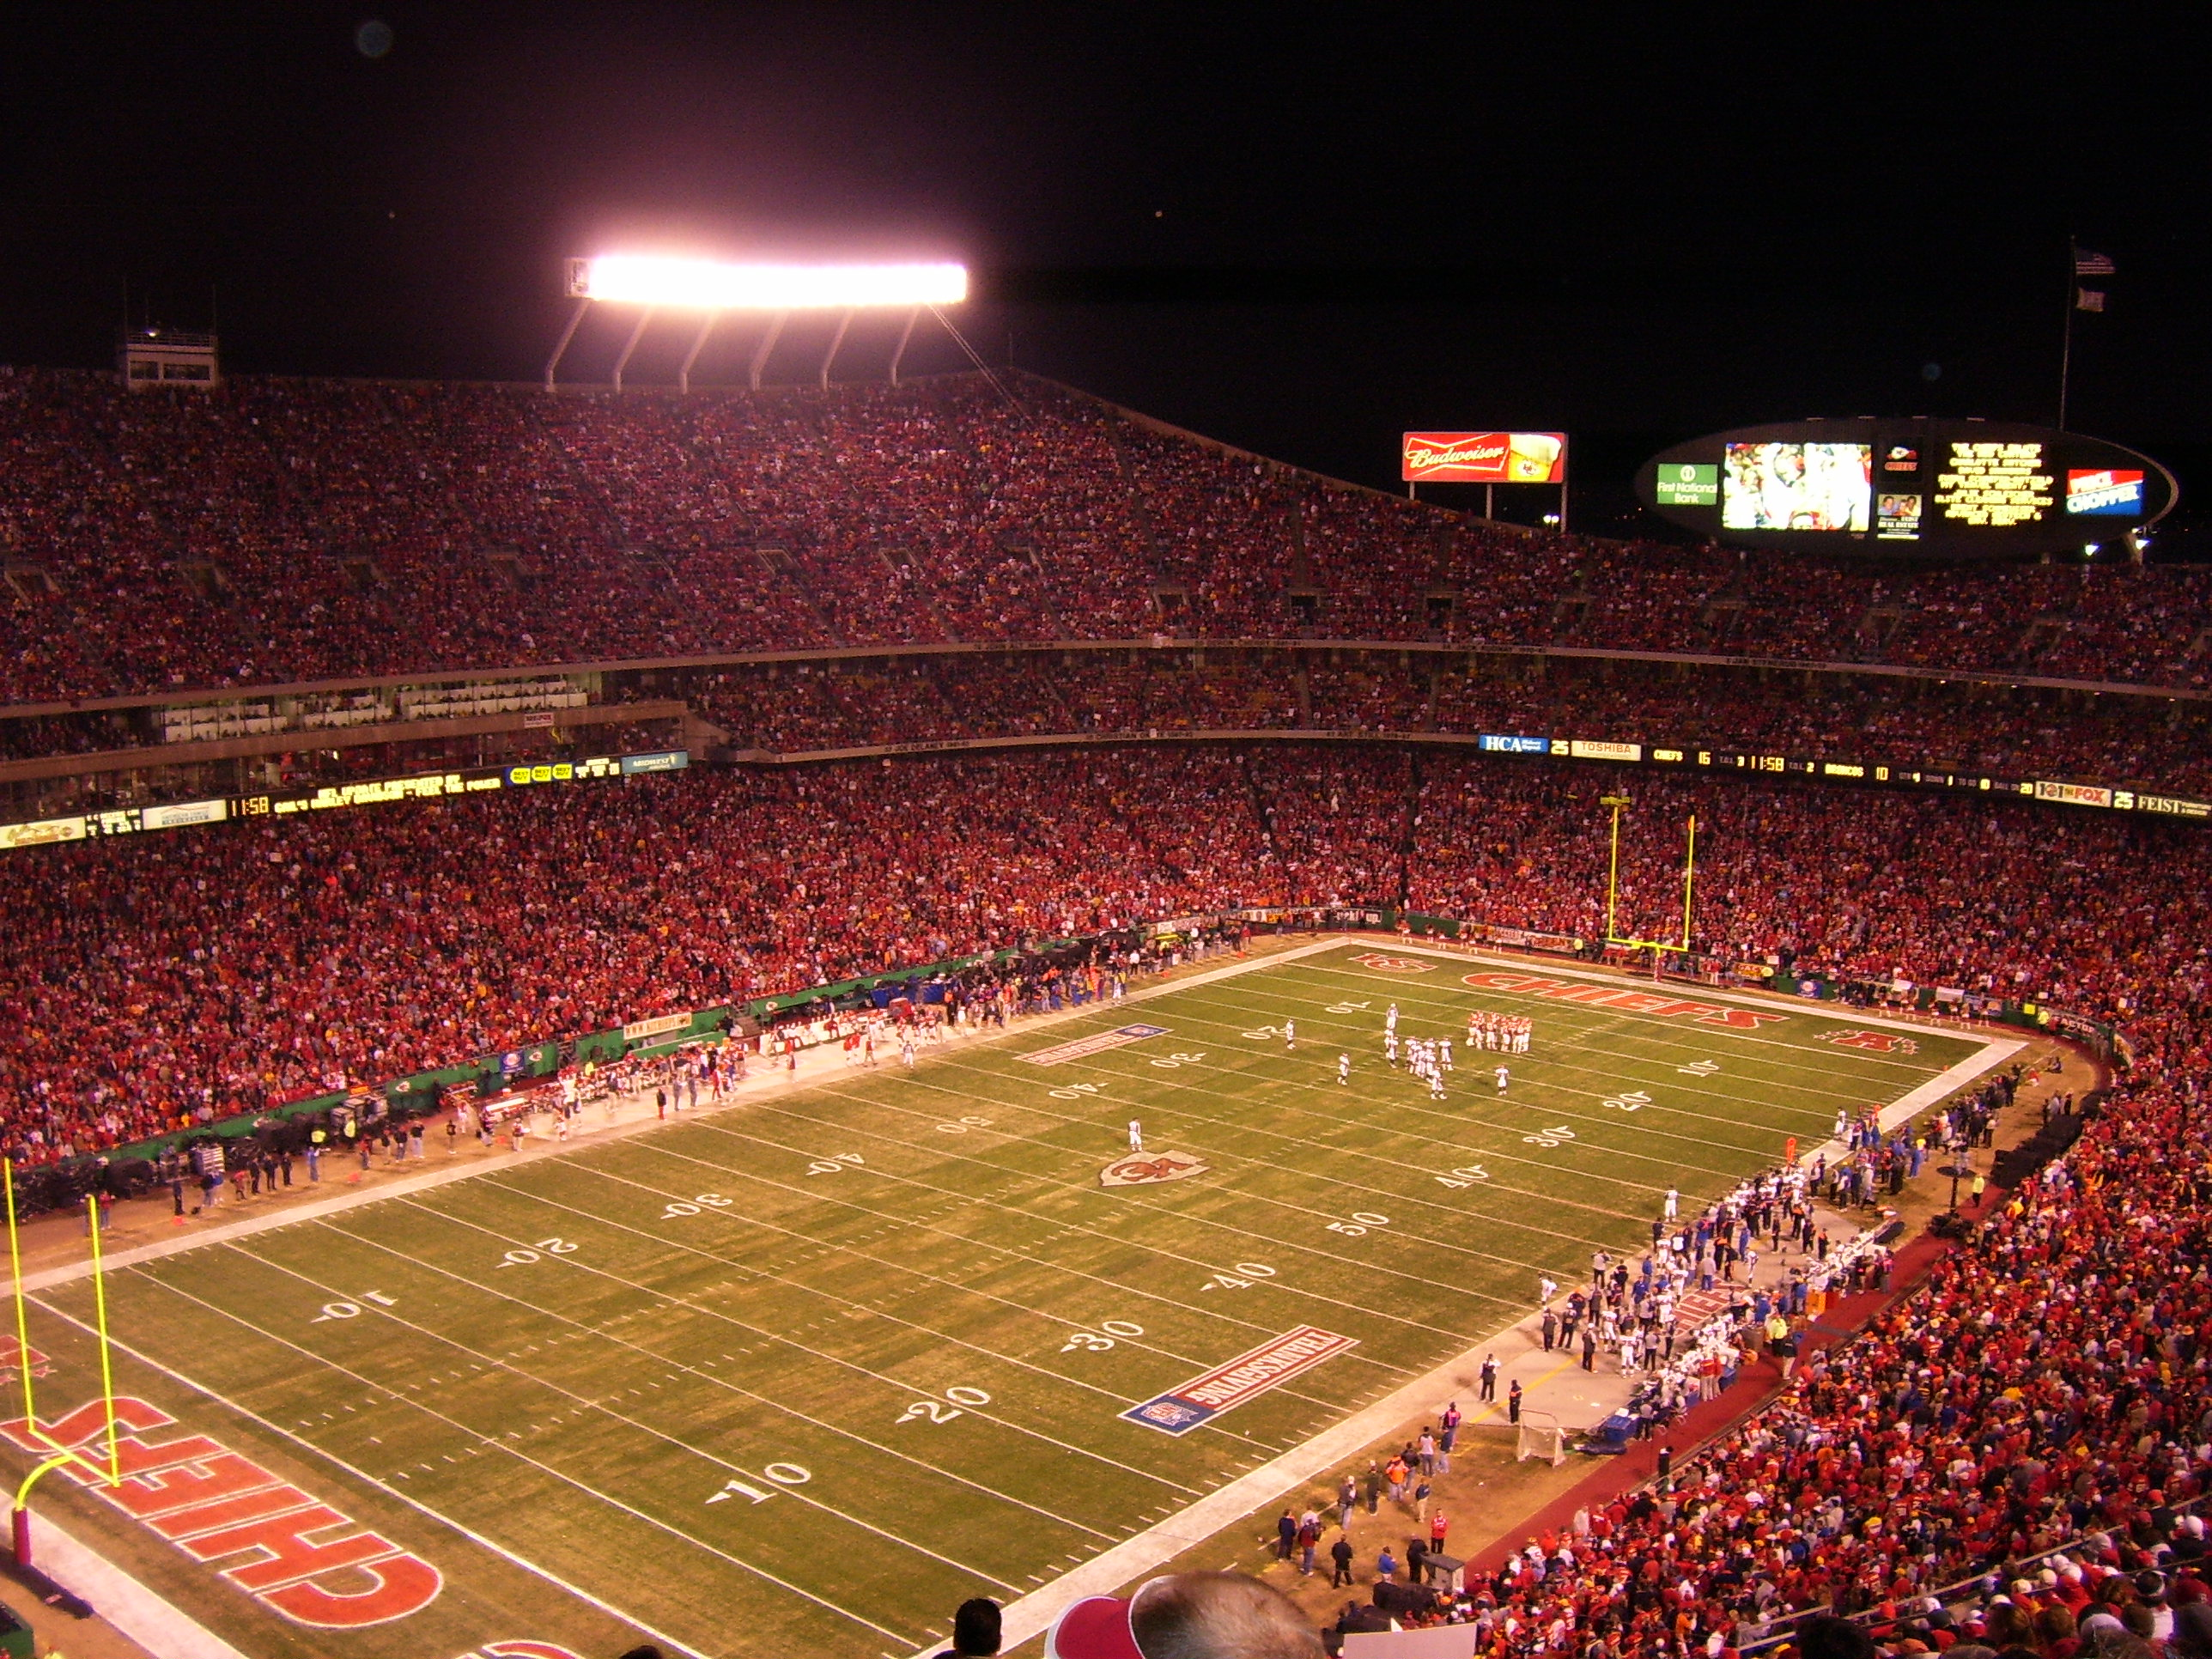 Denver Broncos at Kansas City Chiefs, NFL Thanksgiving tripleheader game at Arrowhead Stadium in Kansas City, Missouri, on November 23, 2006.